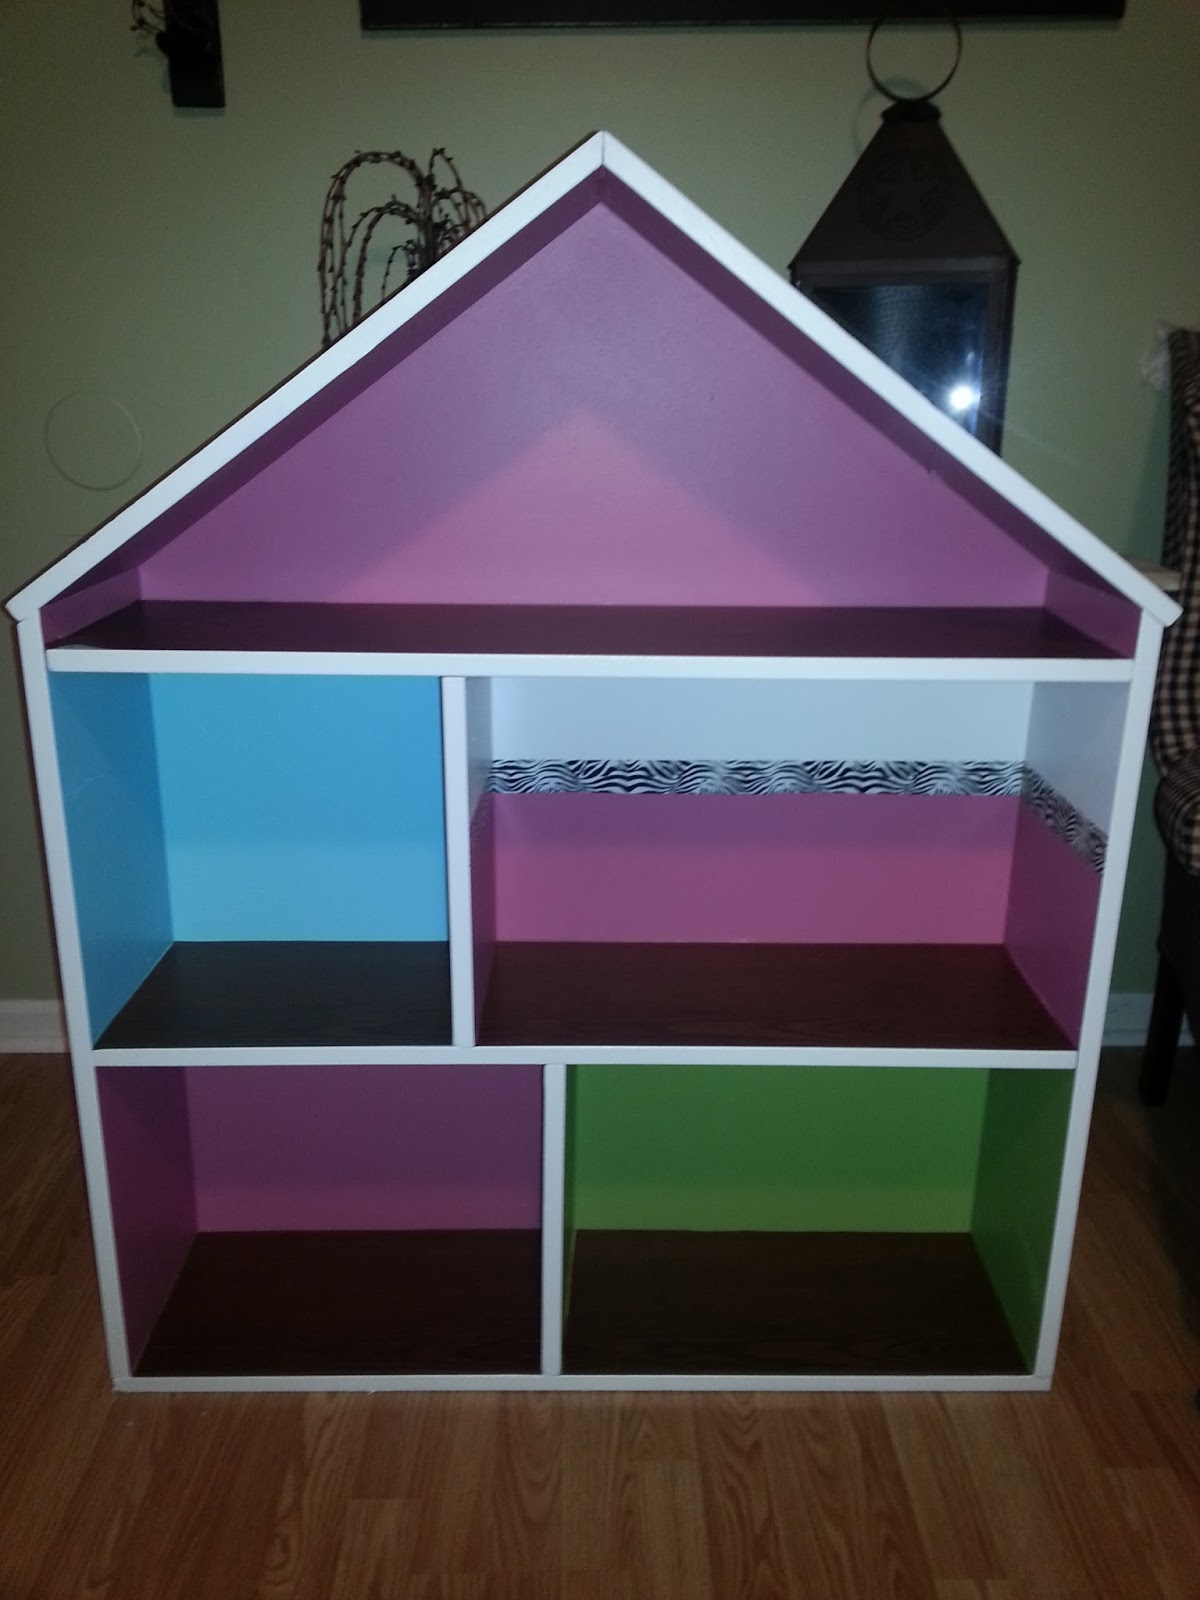 Diy barbie house dimensions